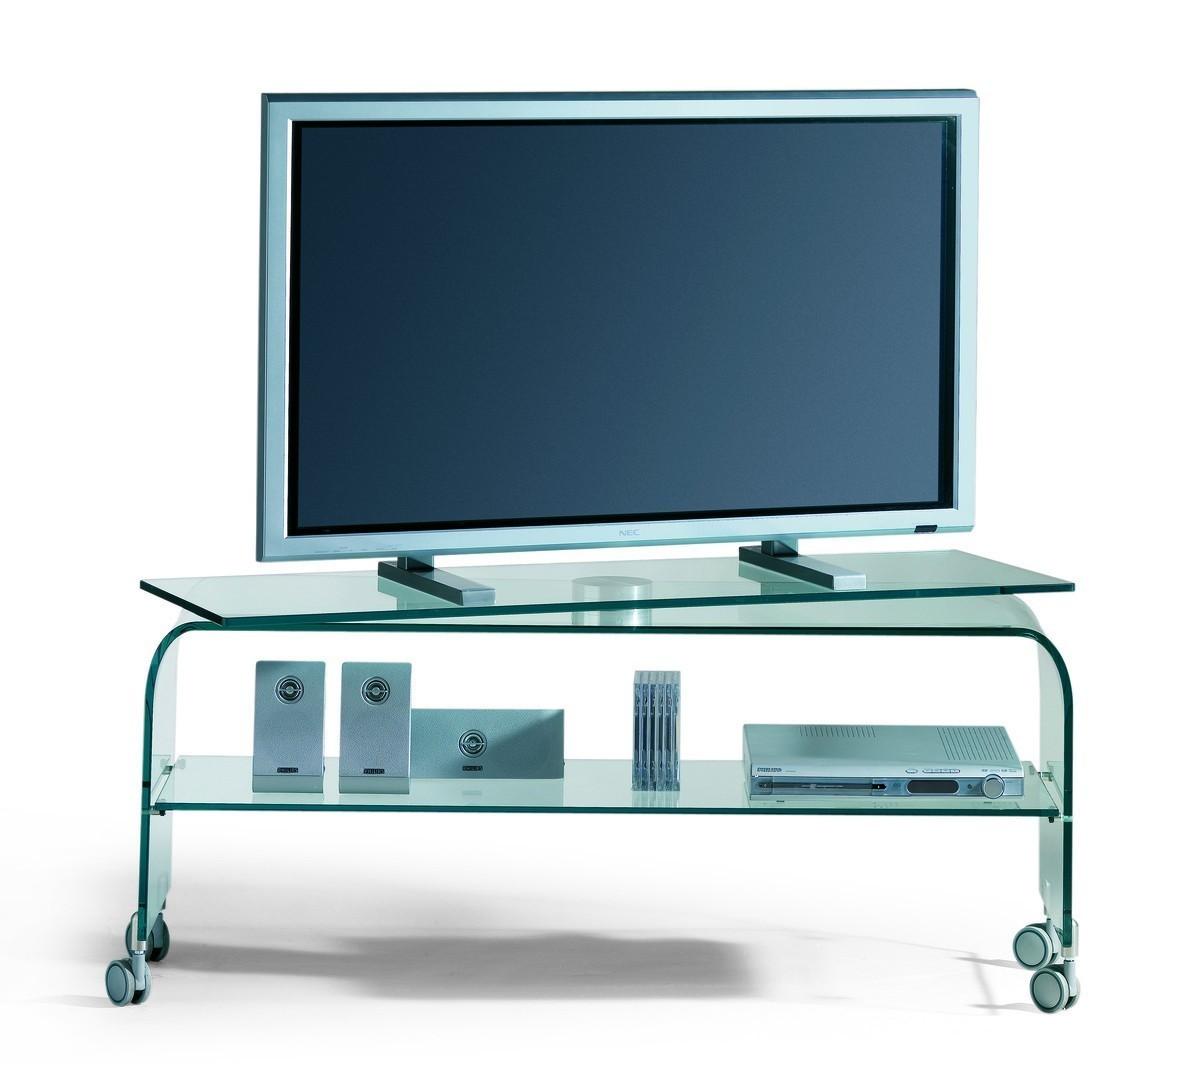 Porta Tv Cristallo Design.Hometrotter Home Style Blog Casa Arredamento Design